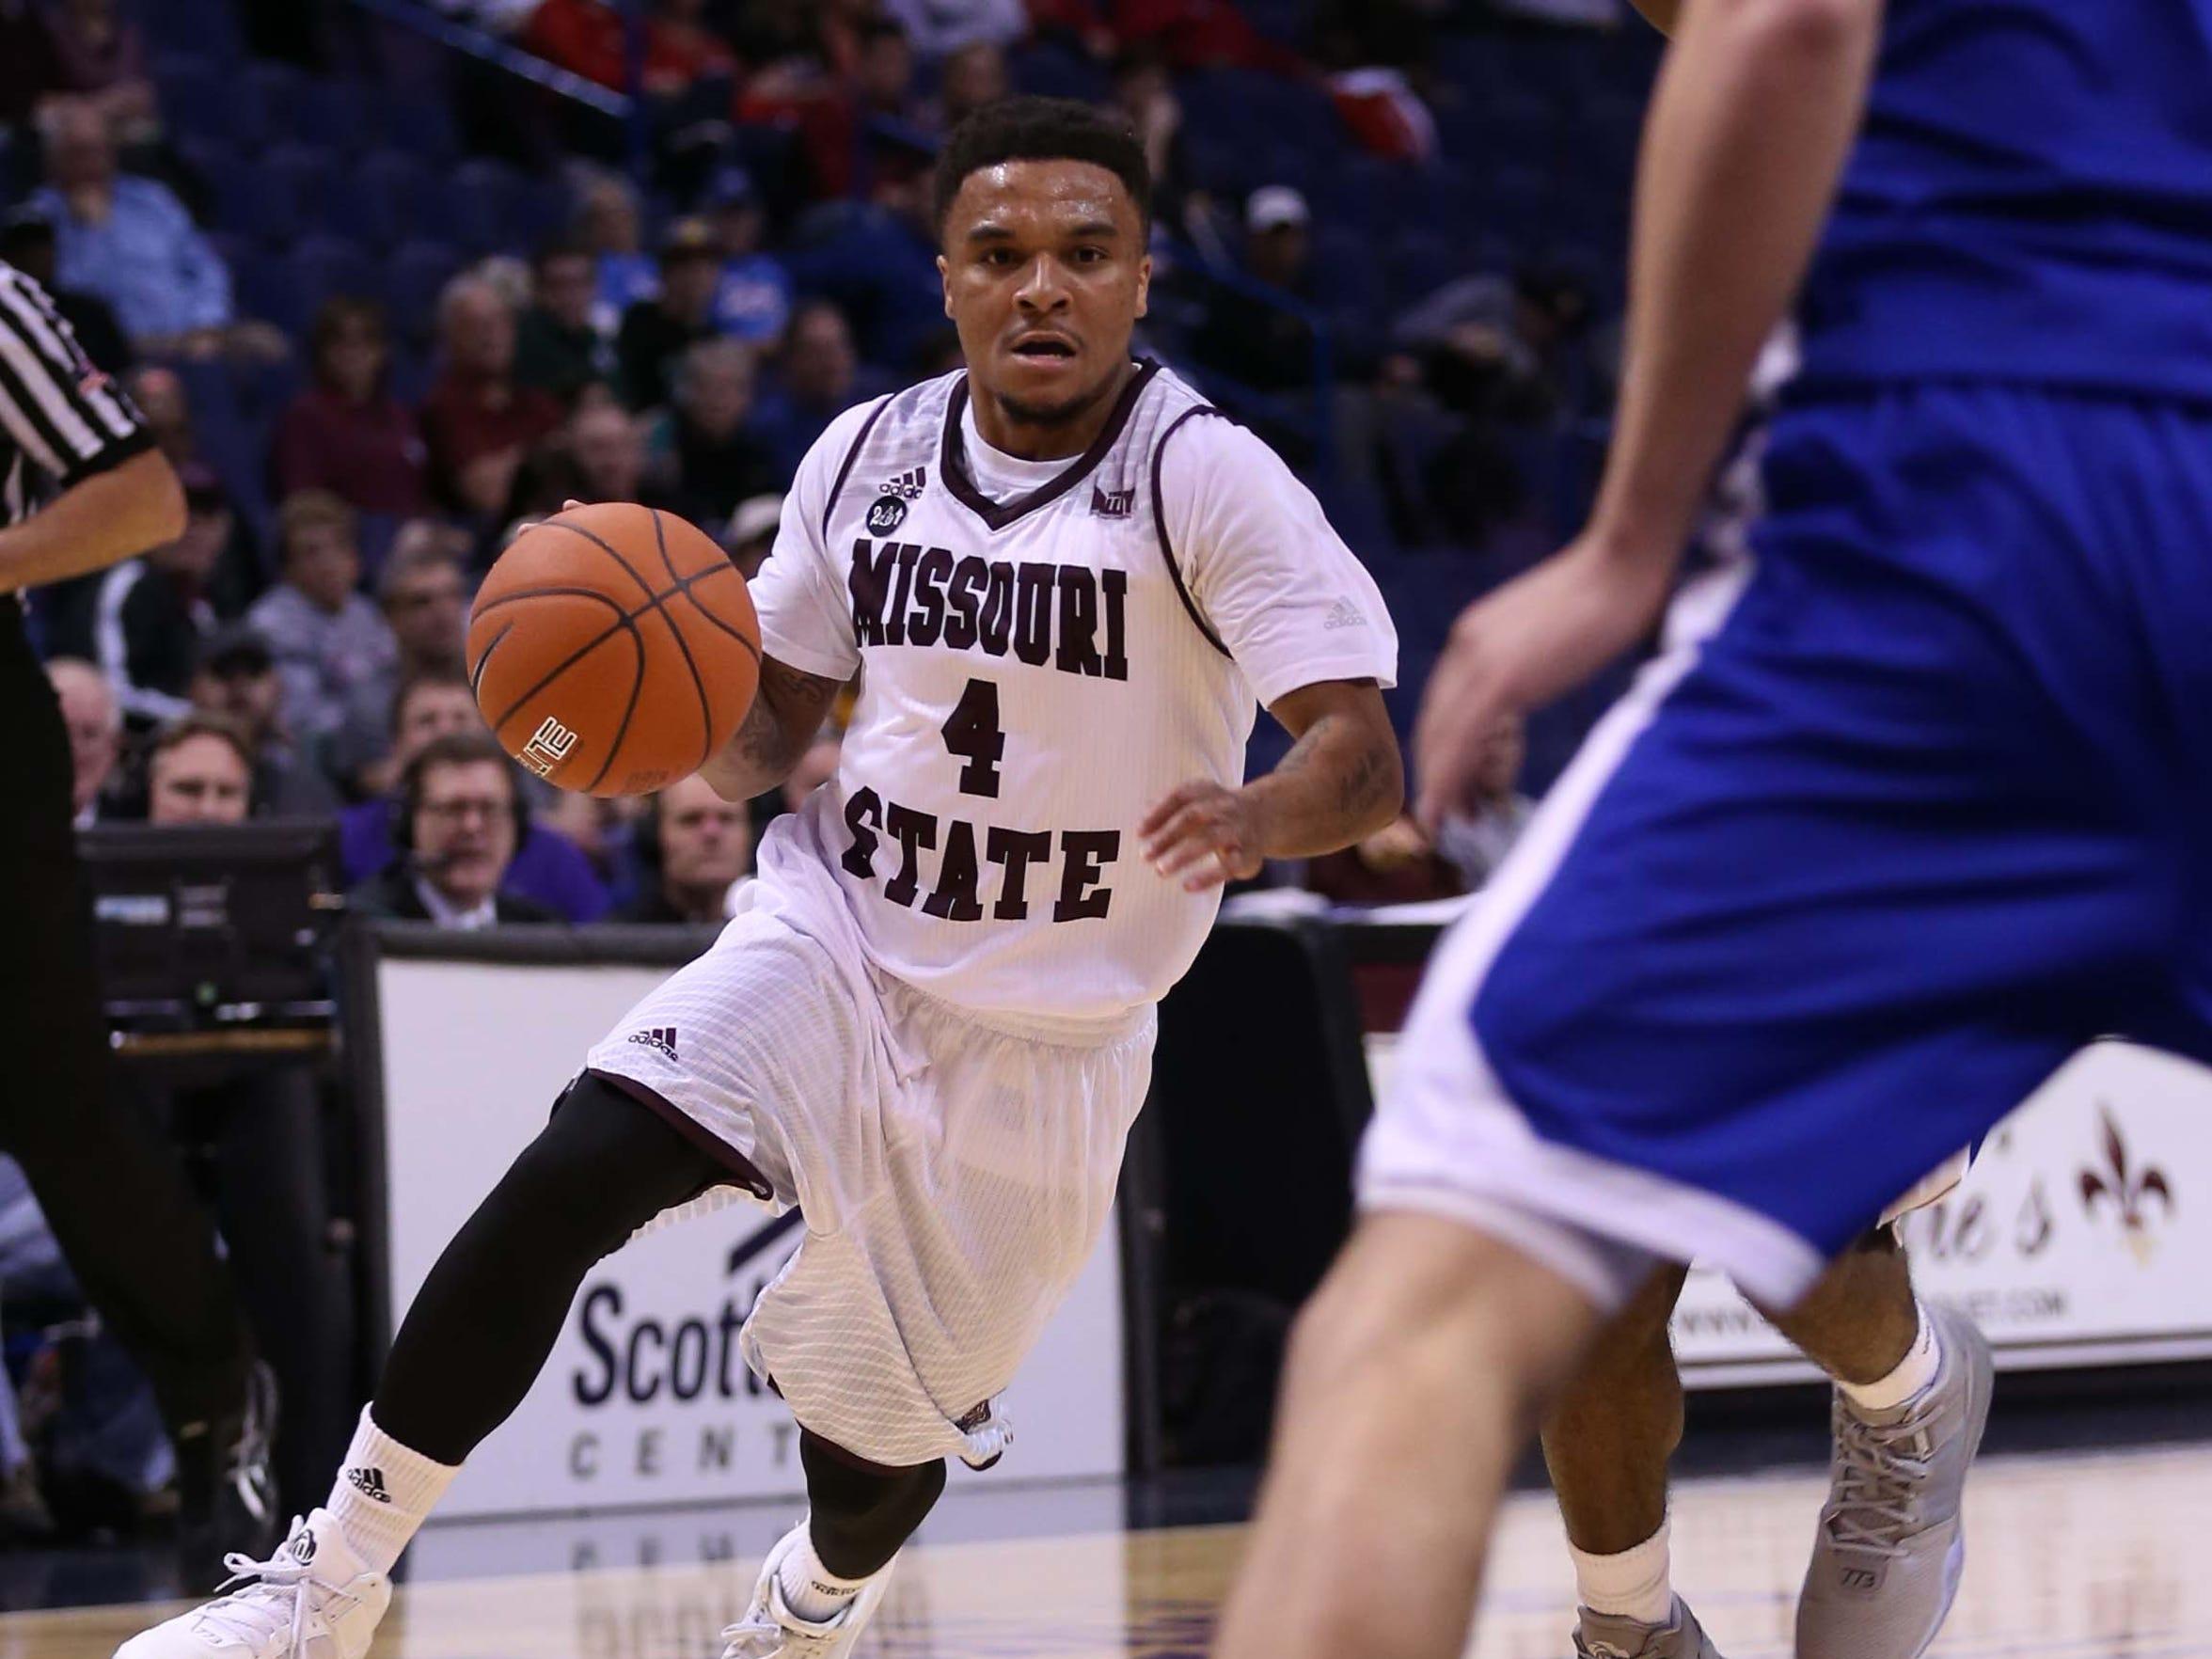 Dequon Miller is the third-highest returning scorer